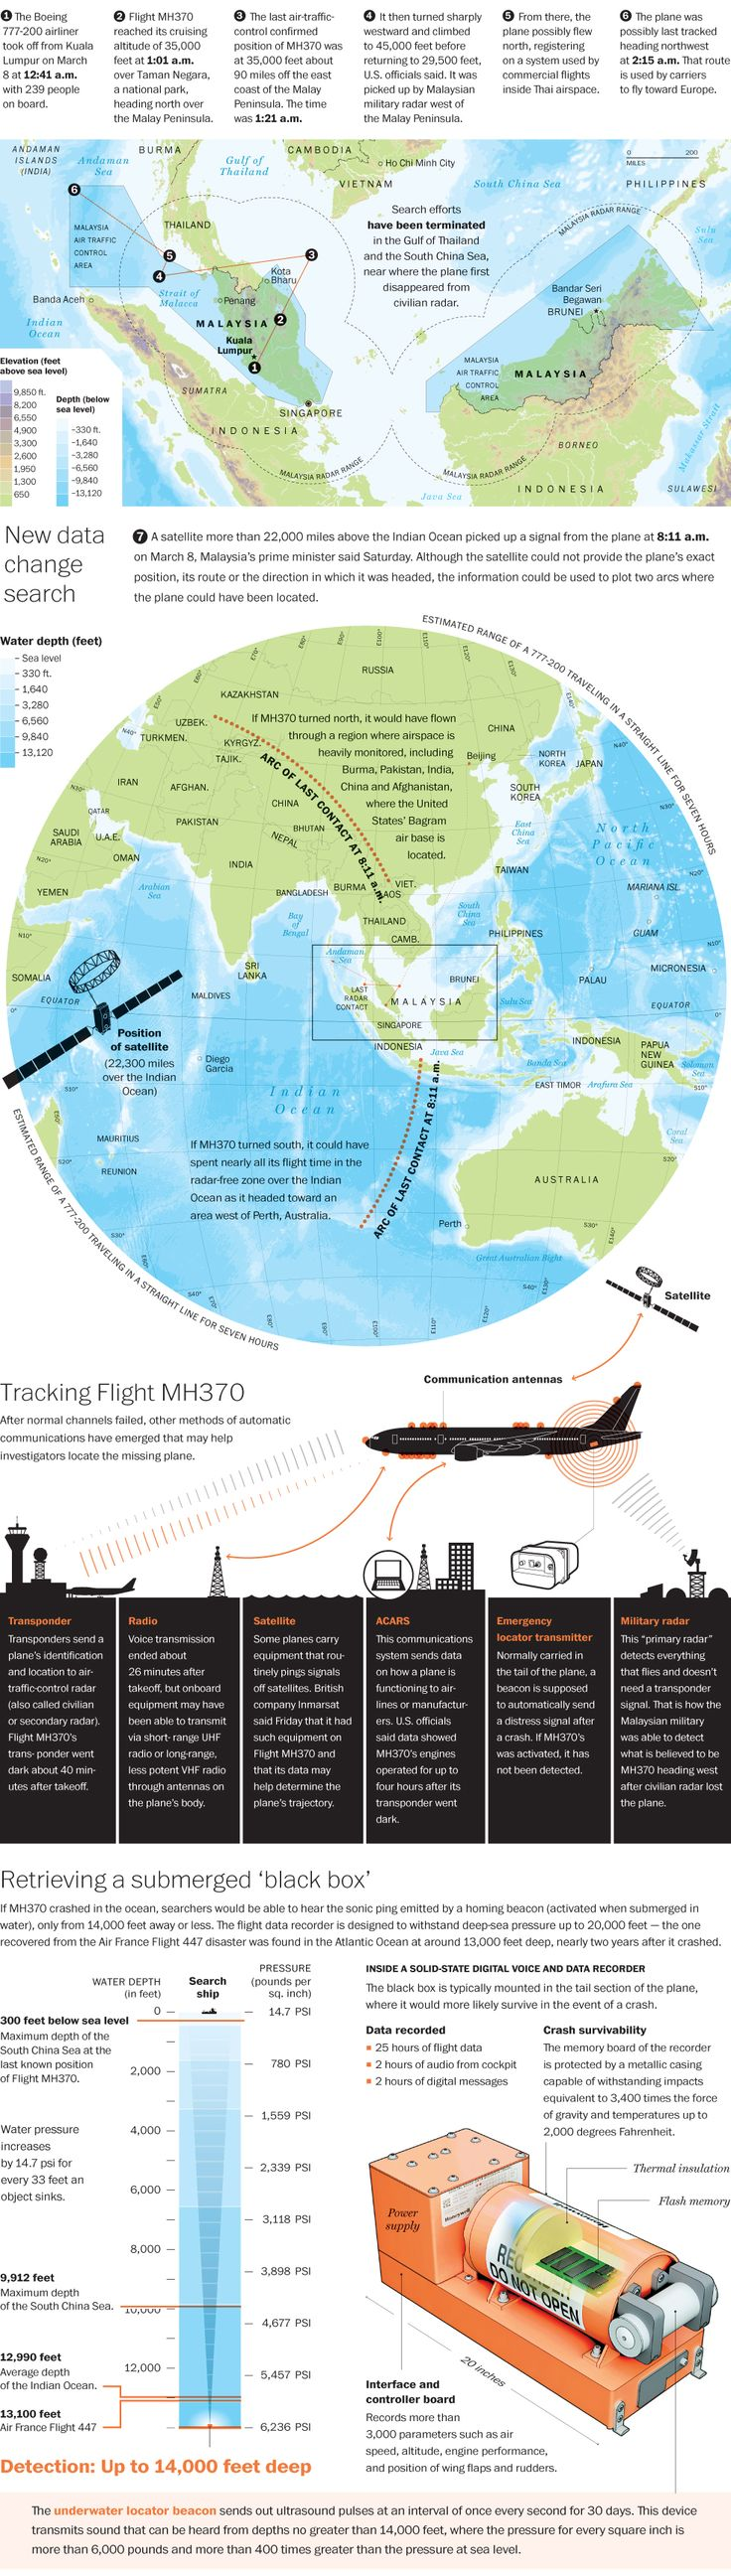 Impressive #infographic about #Malaysian Flight MH370 via @Susan_Hozak and @Inmarsat_plc